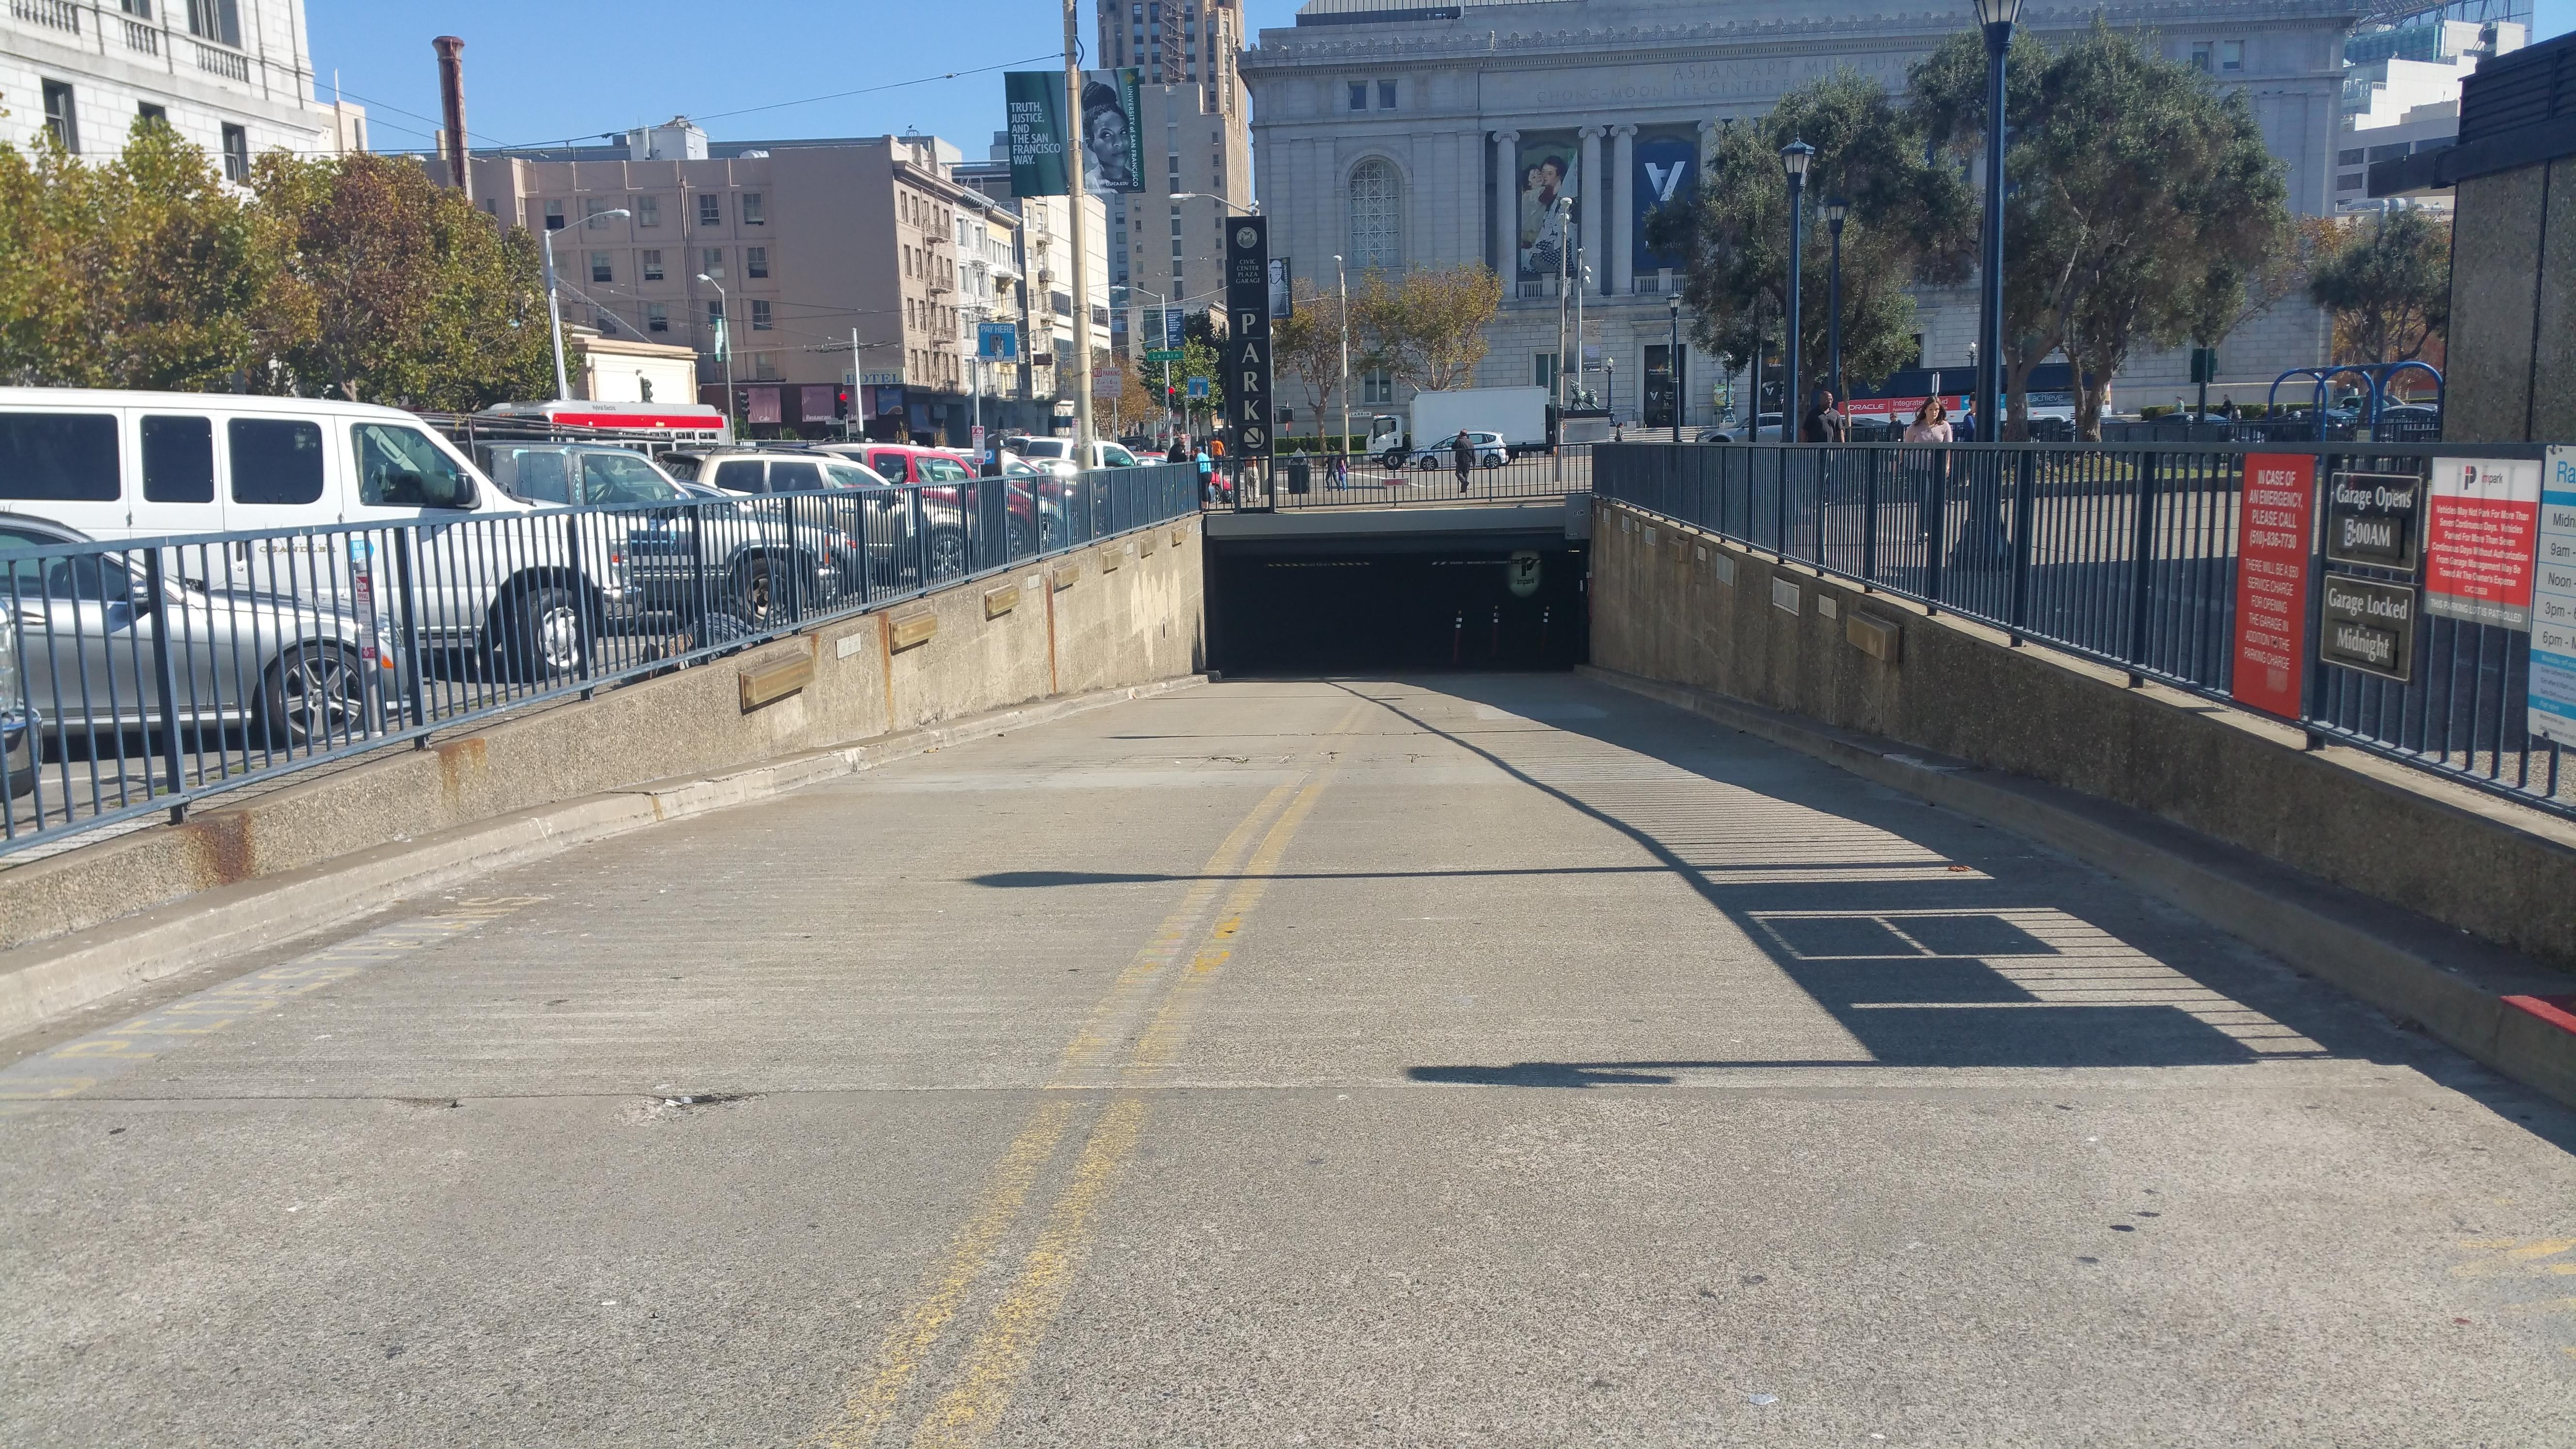 Civic Center Garage: Civic Center Plaza Garage - Parking In San Francisco